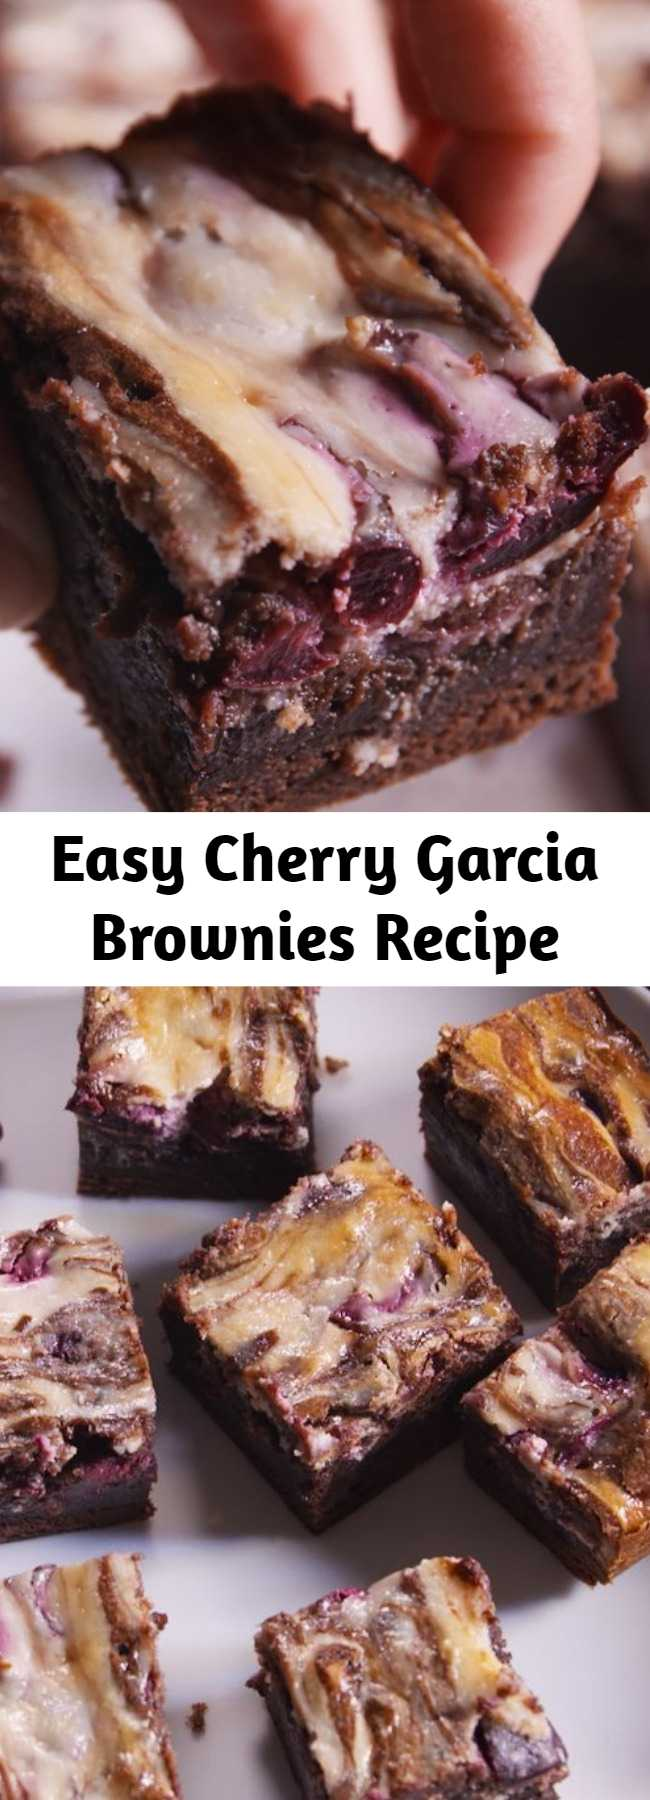 Easy Cherry Garcia Brownies Recipe - Looking for an easy brownie recipe? This Cherry Garcia Brownies Recipe is the best.